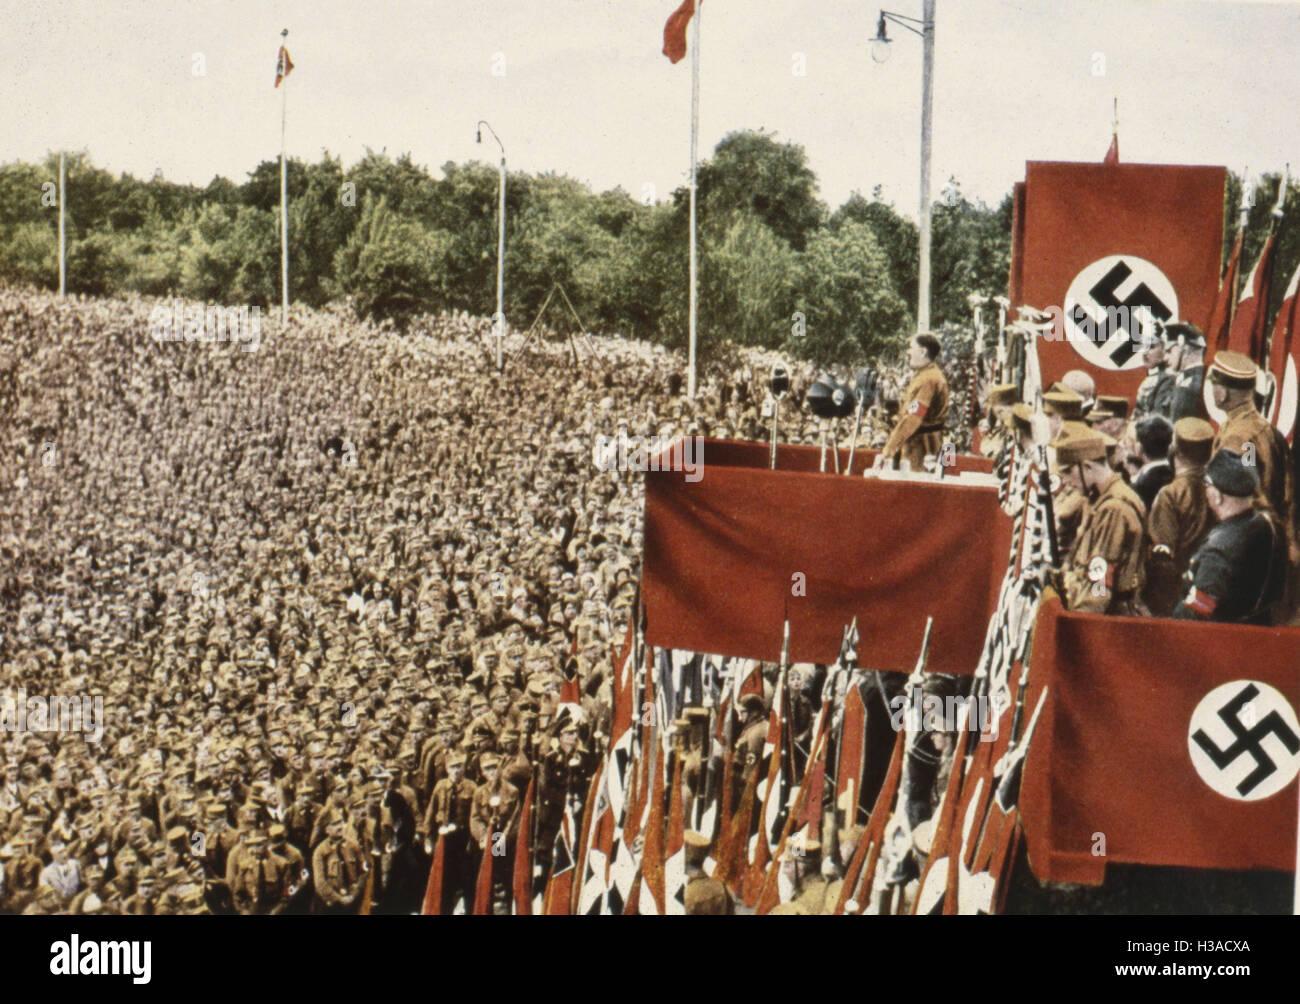 Adolf Hitler at the SA rally in Dortmund, 1933 - Stock Image